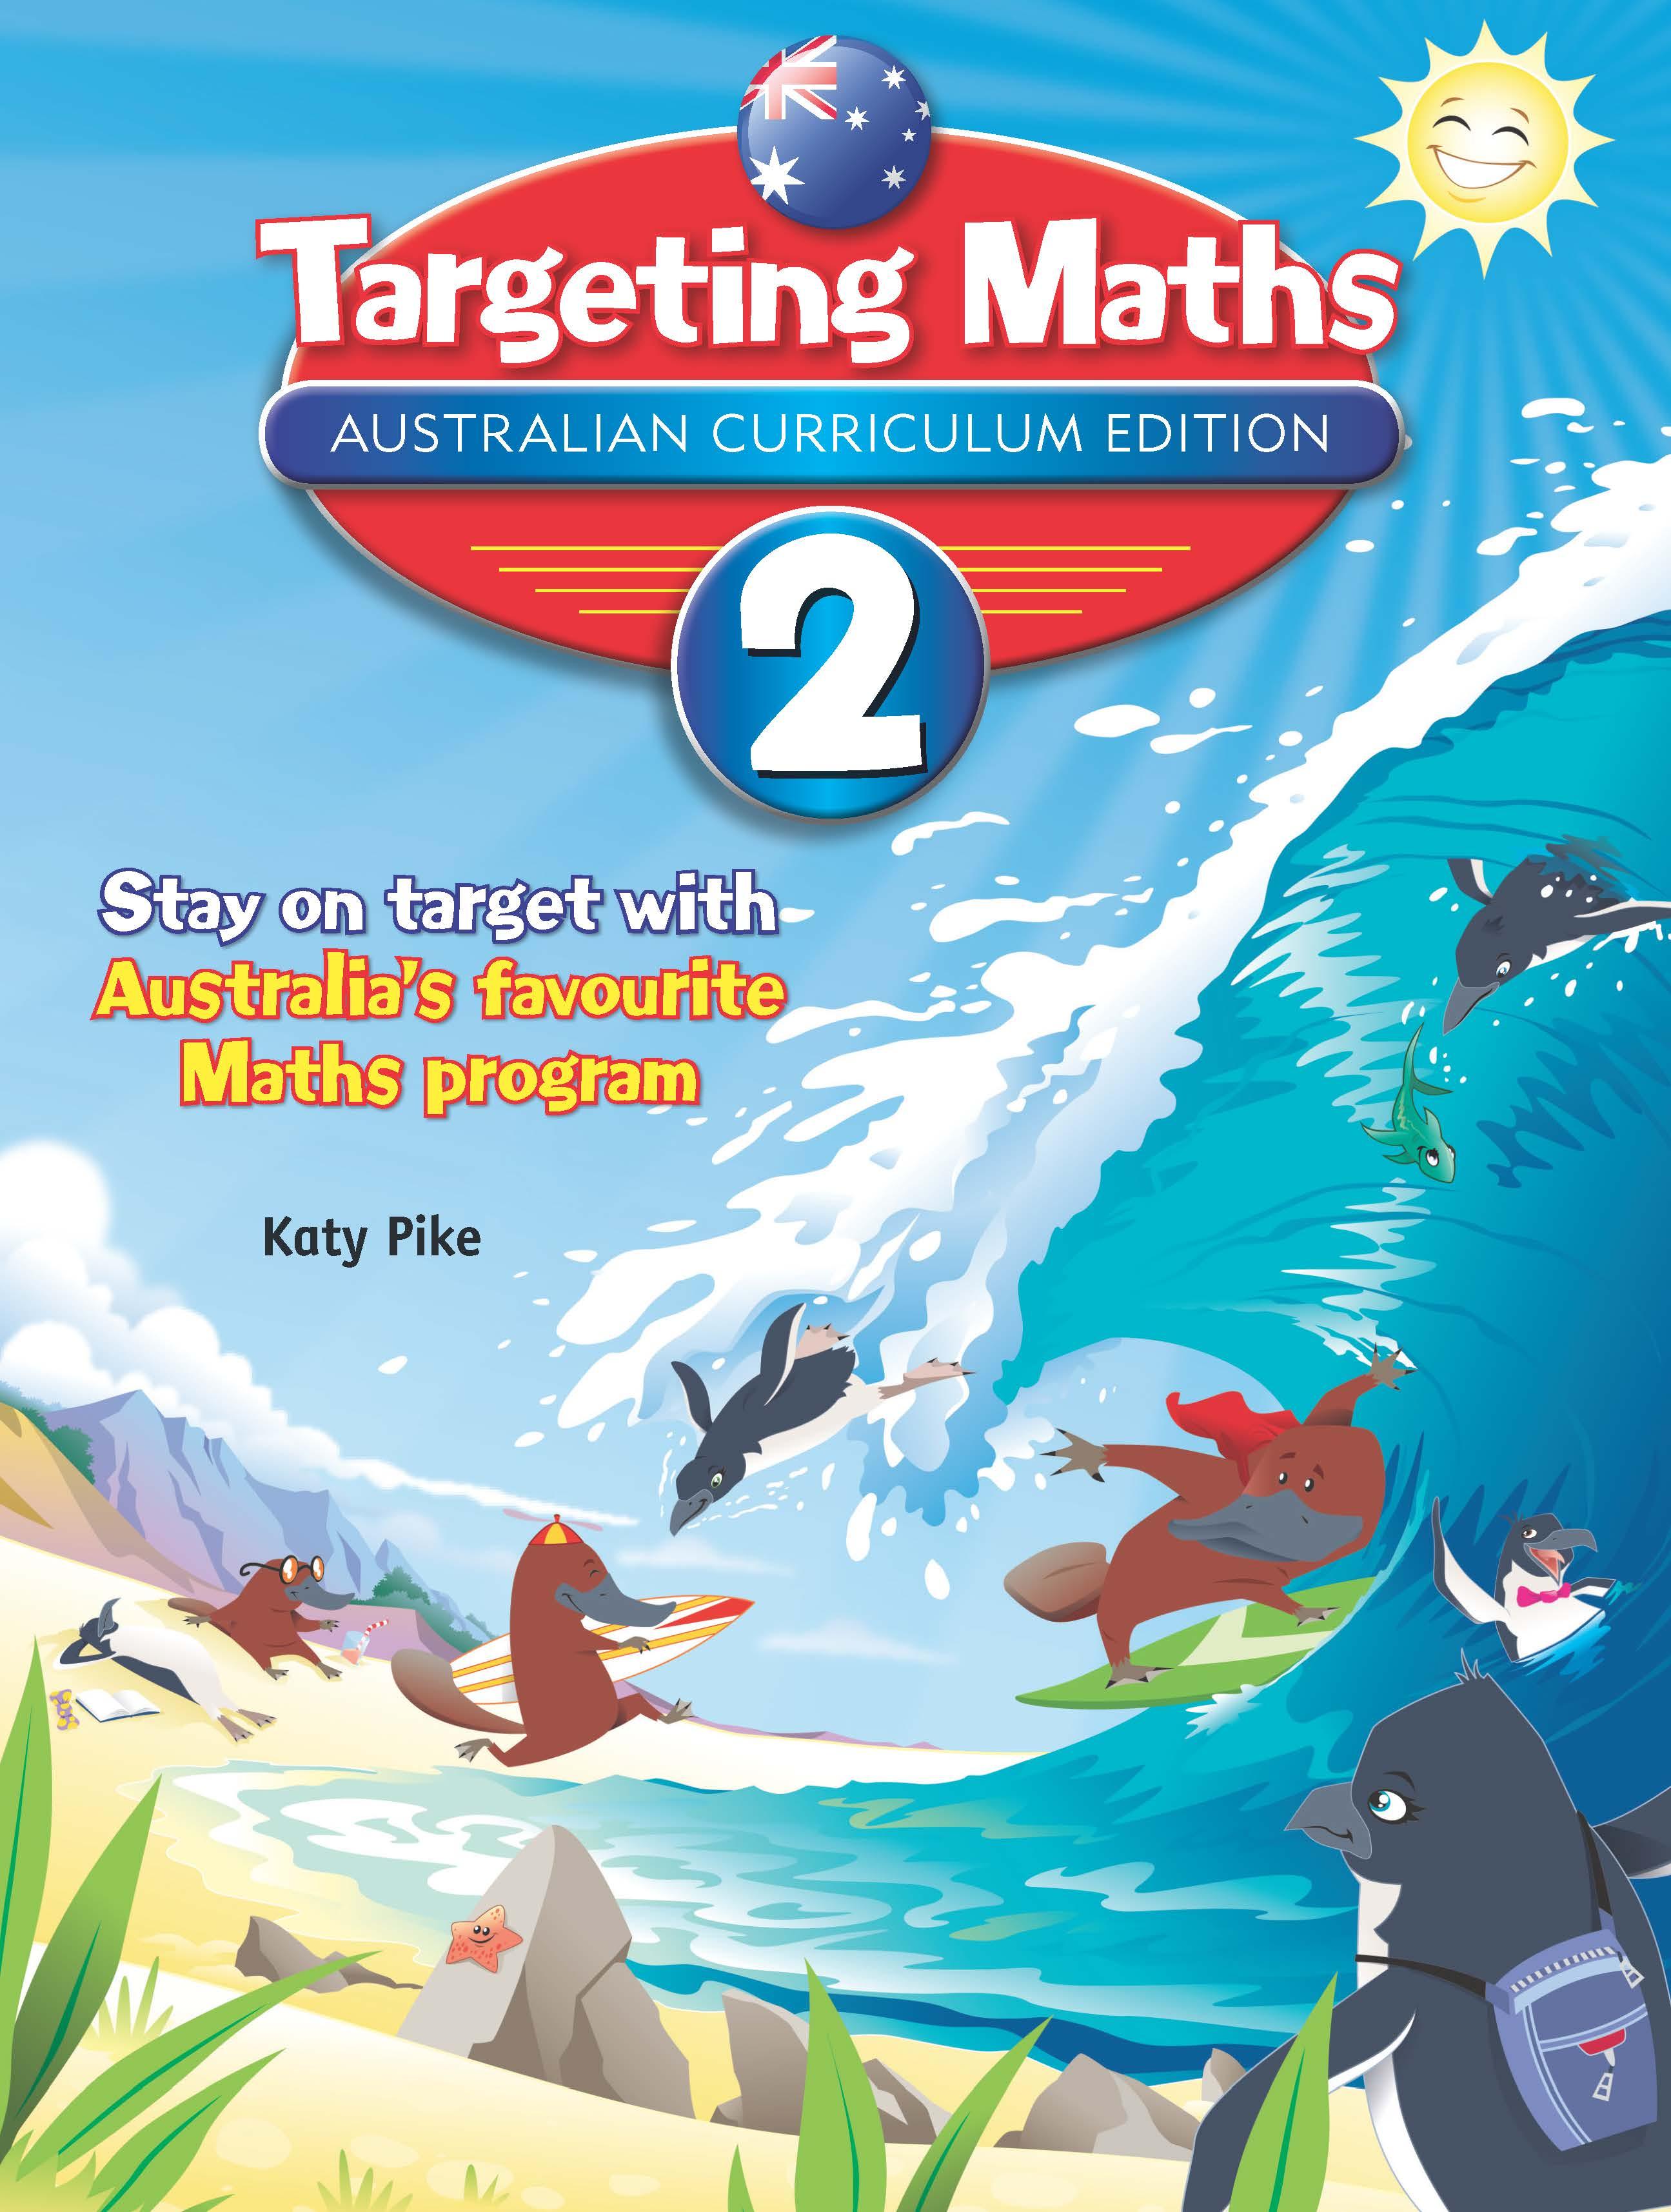 Targeting Maths Australian Curriculum Edition Student Book Year 2